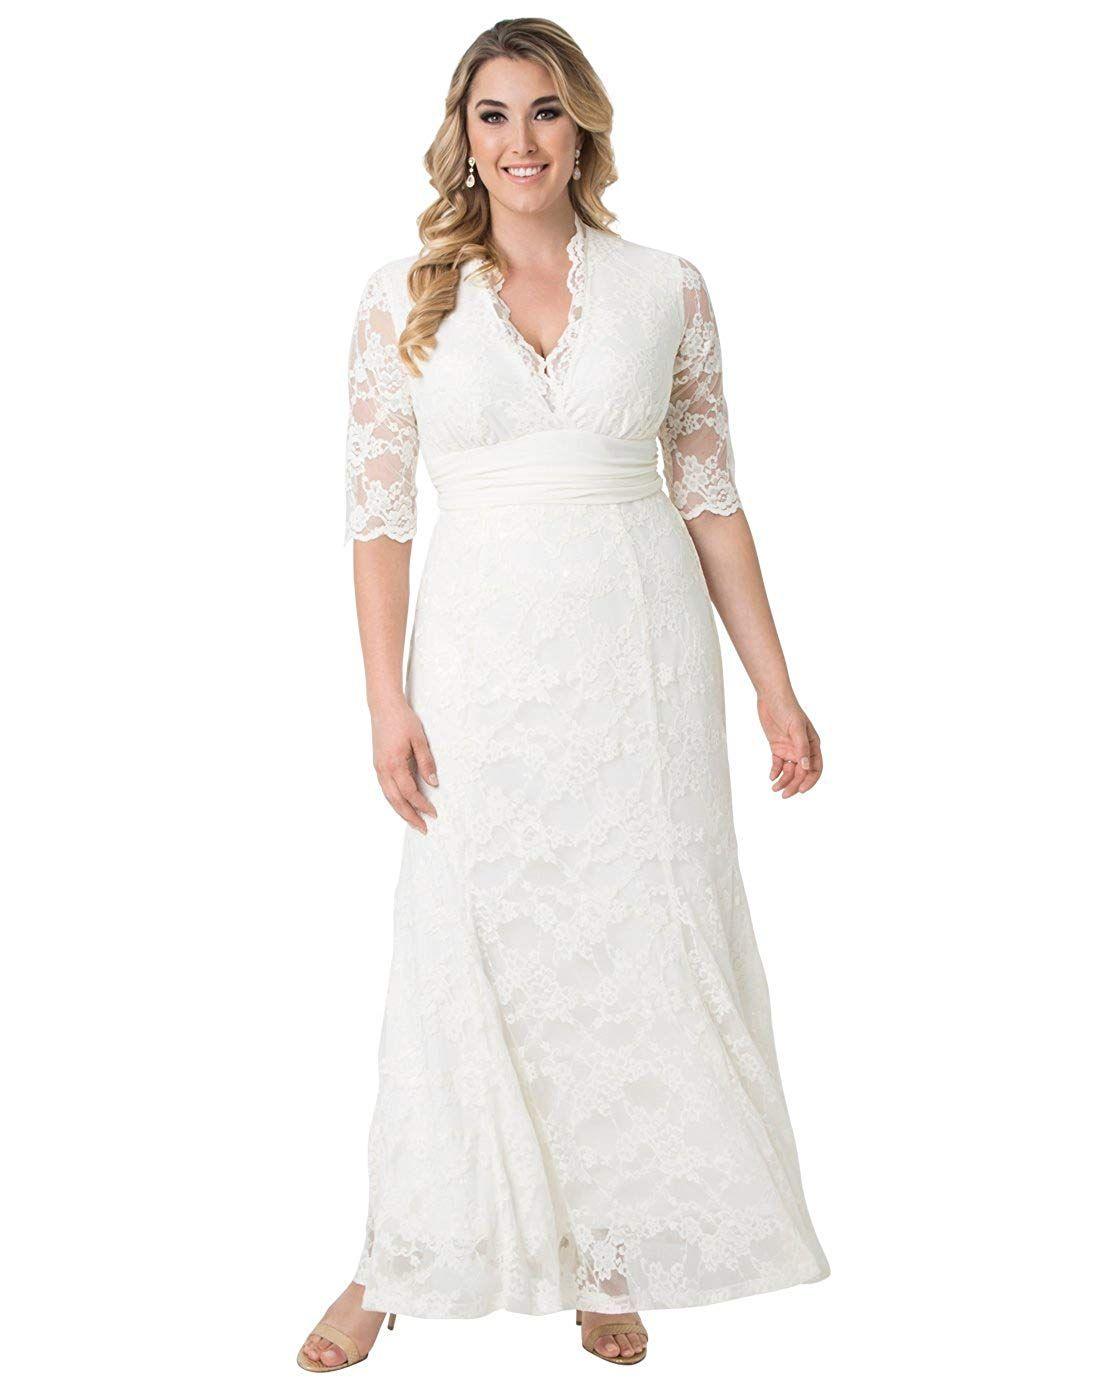 Kiyonna Women S Plus Size Amour Lace Wedding Gown At Women S Clothing Store Kiyonna Women S Plus Lace Evening Gowns Lace Dress Long Evening Dresses Prom [ 1400 x 1100 Pixel ]